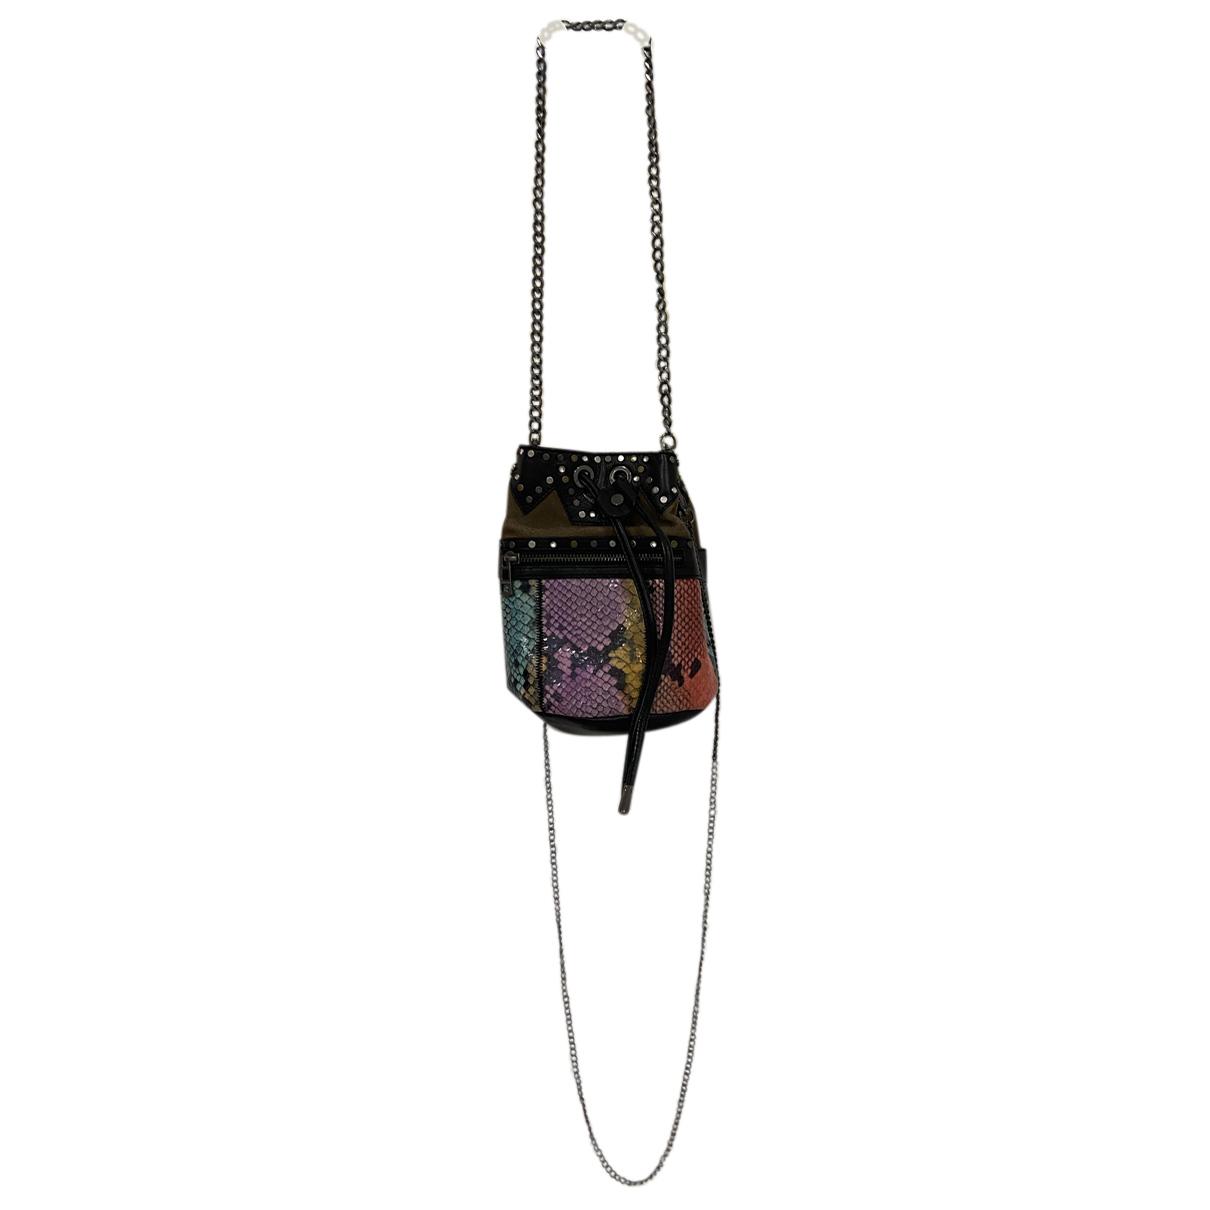 Zadig & Voltaire N Multicolour Leather handbag for Women N